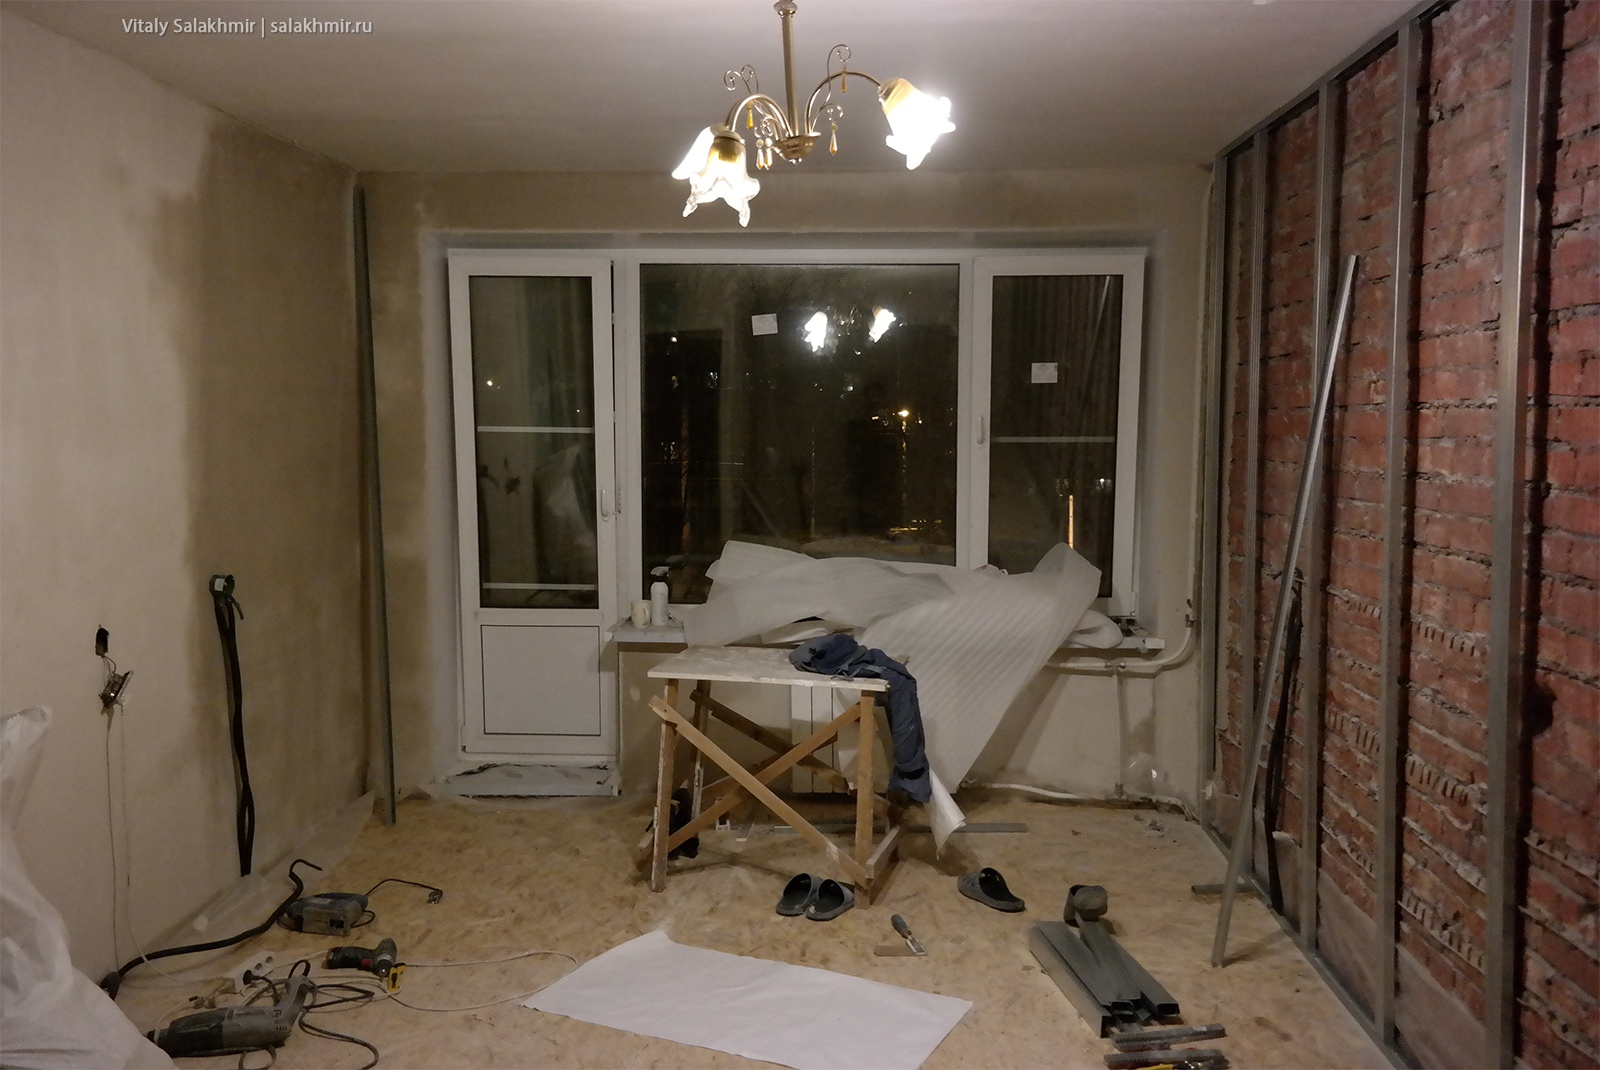 Ремонт квартиры в Санкт-Петербурге 2019